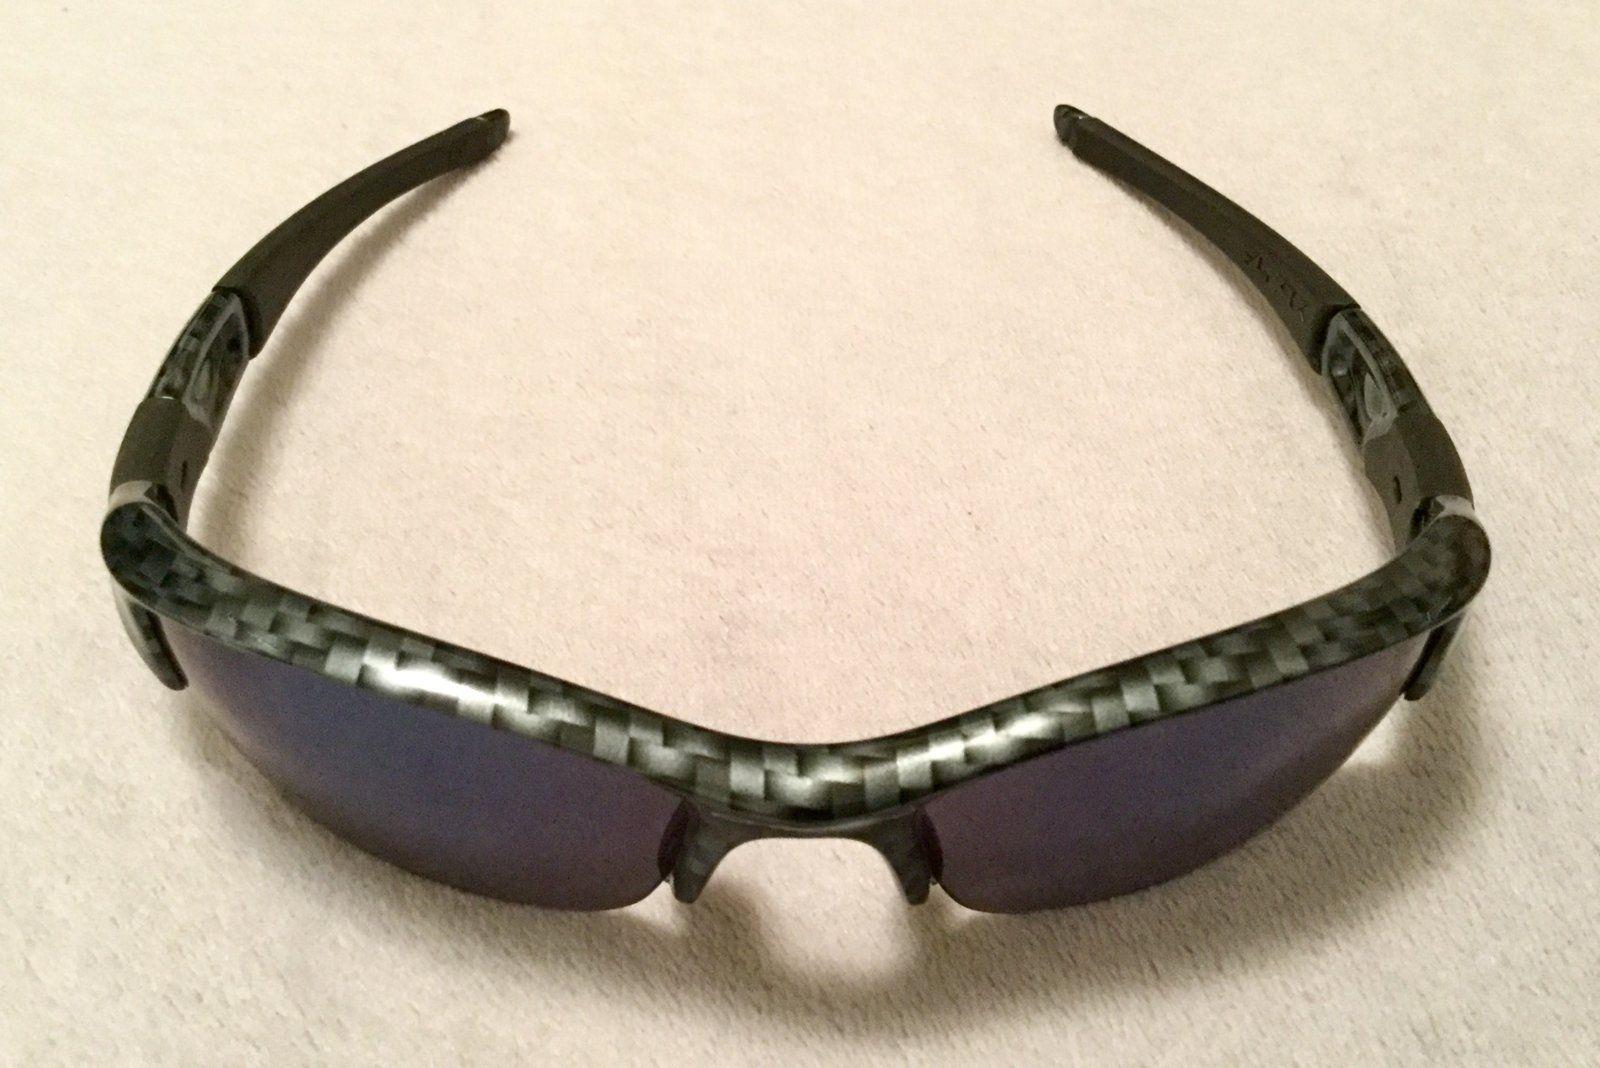 Oakley OCP Flak Jacket Sunglasses (New) - A2067349-688A-40E8-8A4B-470ACBF5E2D7.jpeg